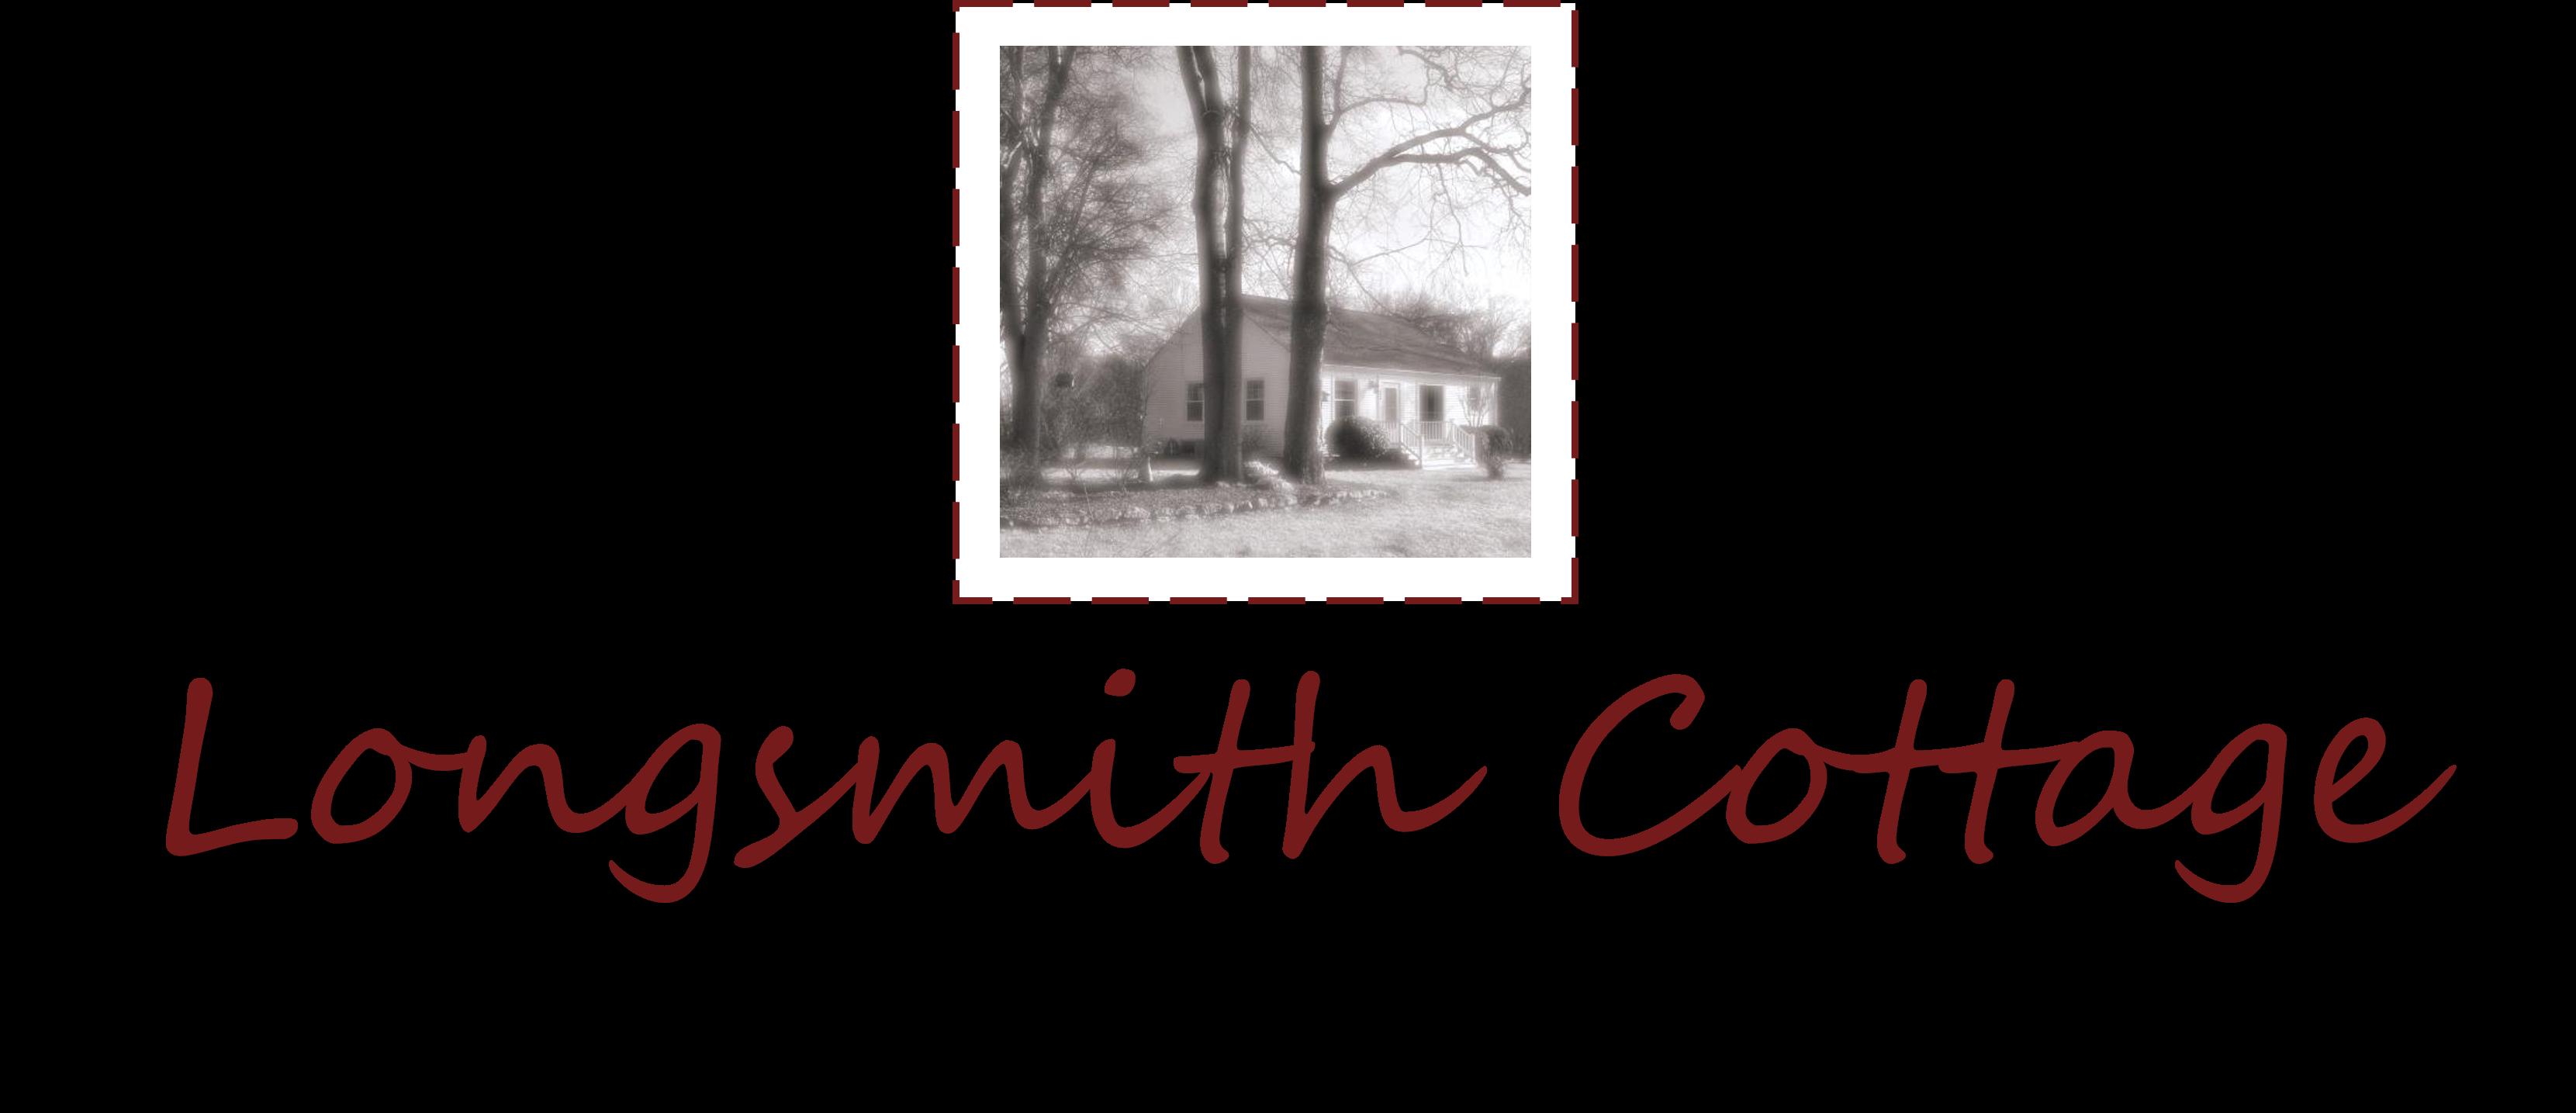 Longsmith Cottage